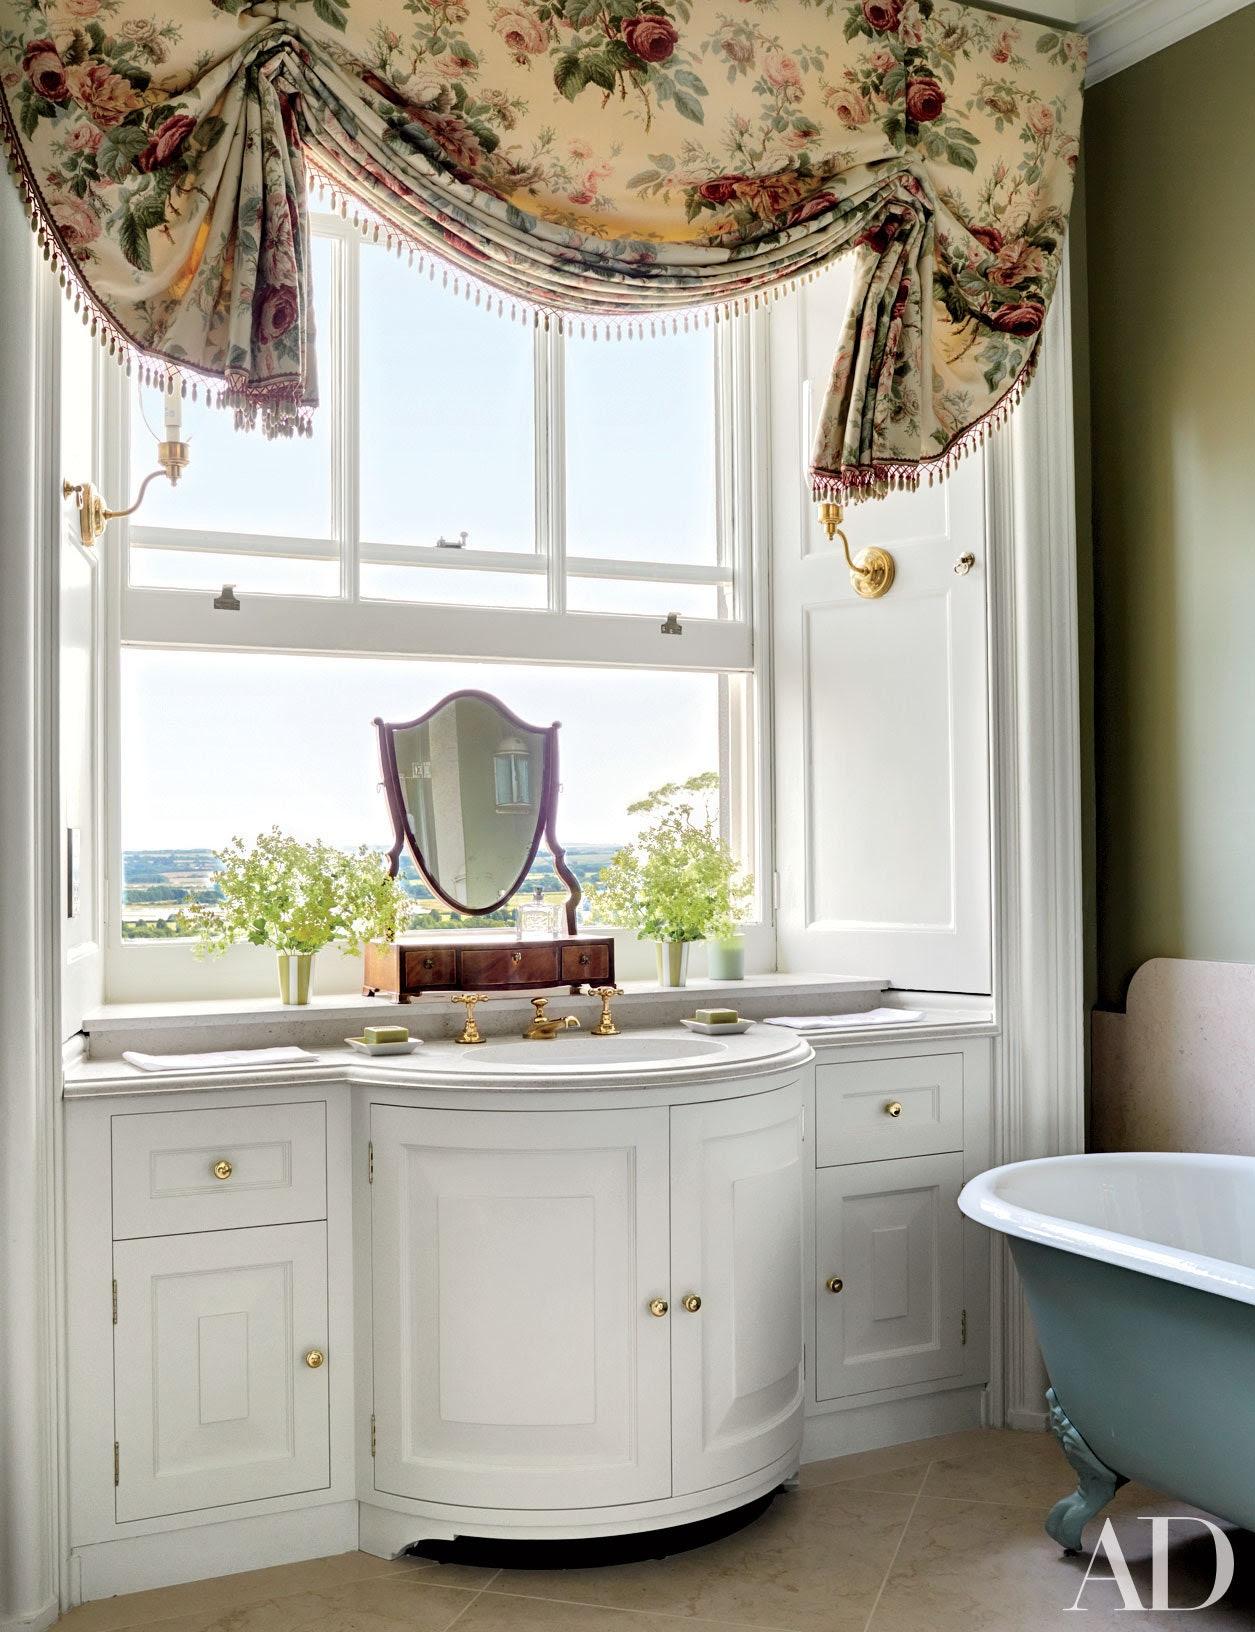 Guest Bathroom Decorating Inspiration Photos ...